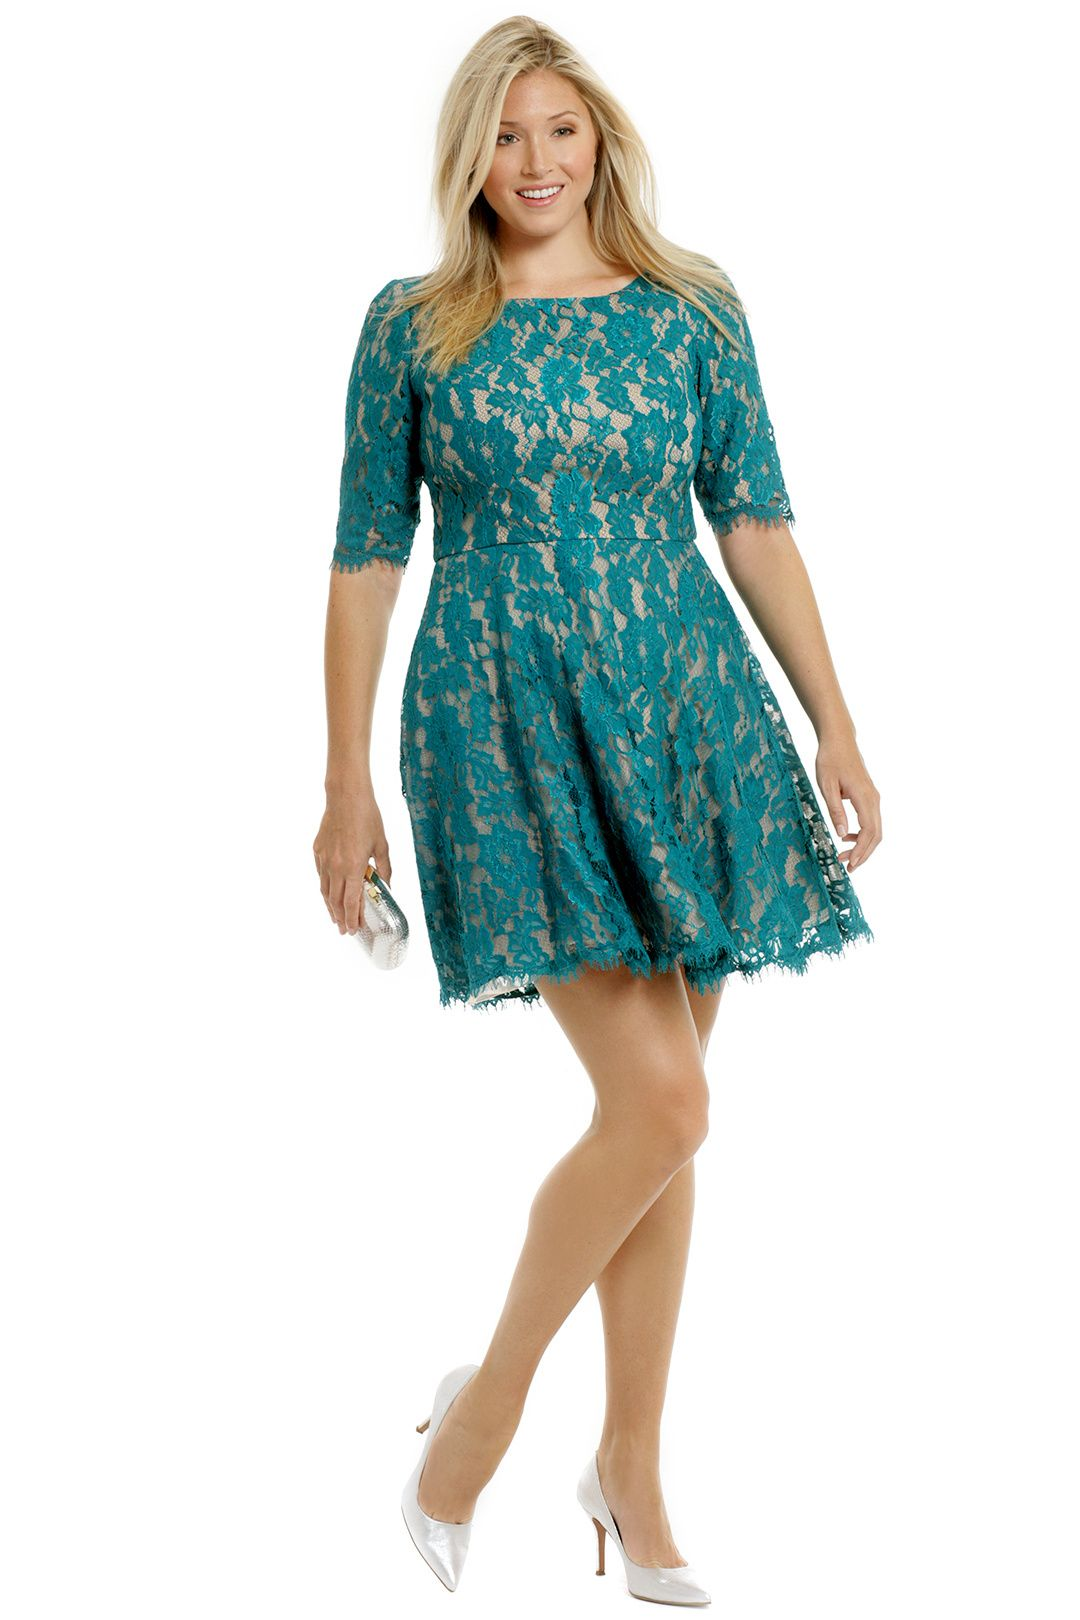 Isabella Dress Dresses, Plus size dresses, Rent dresses